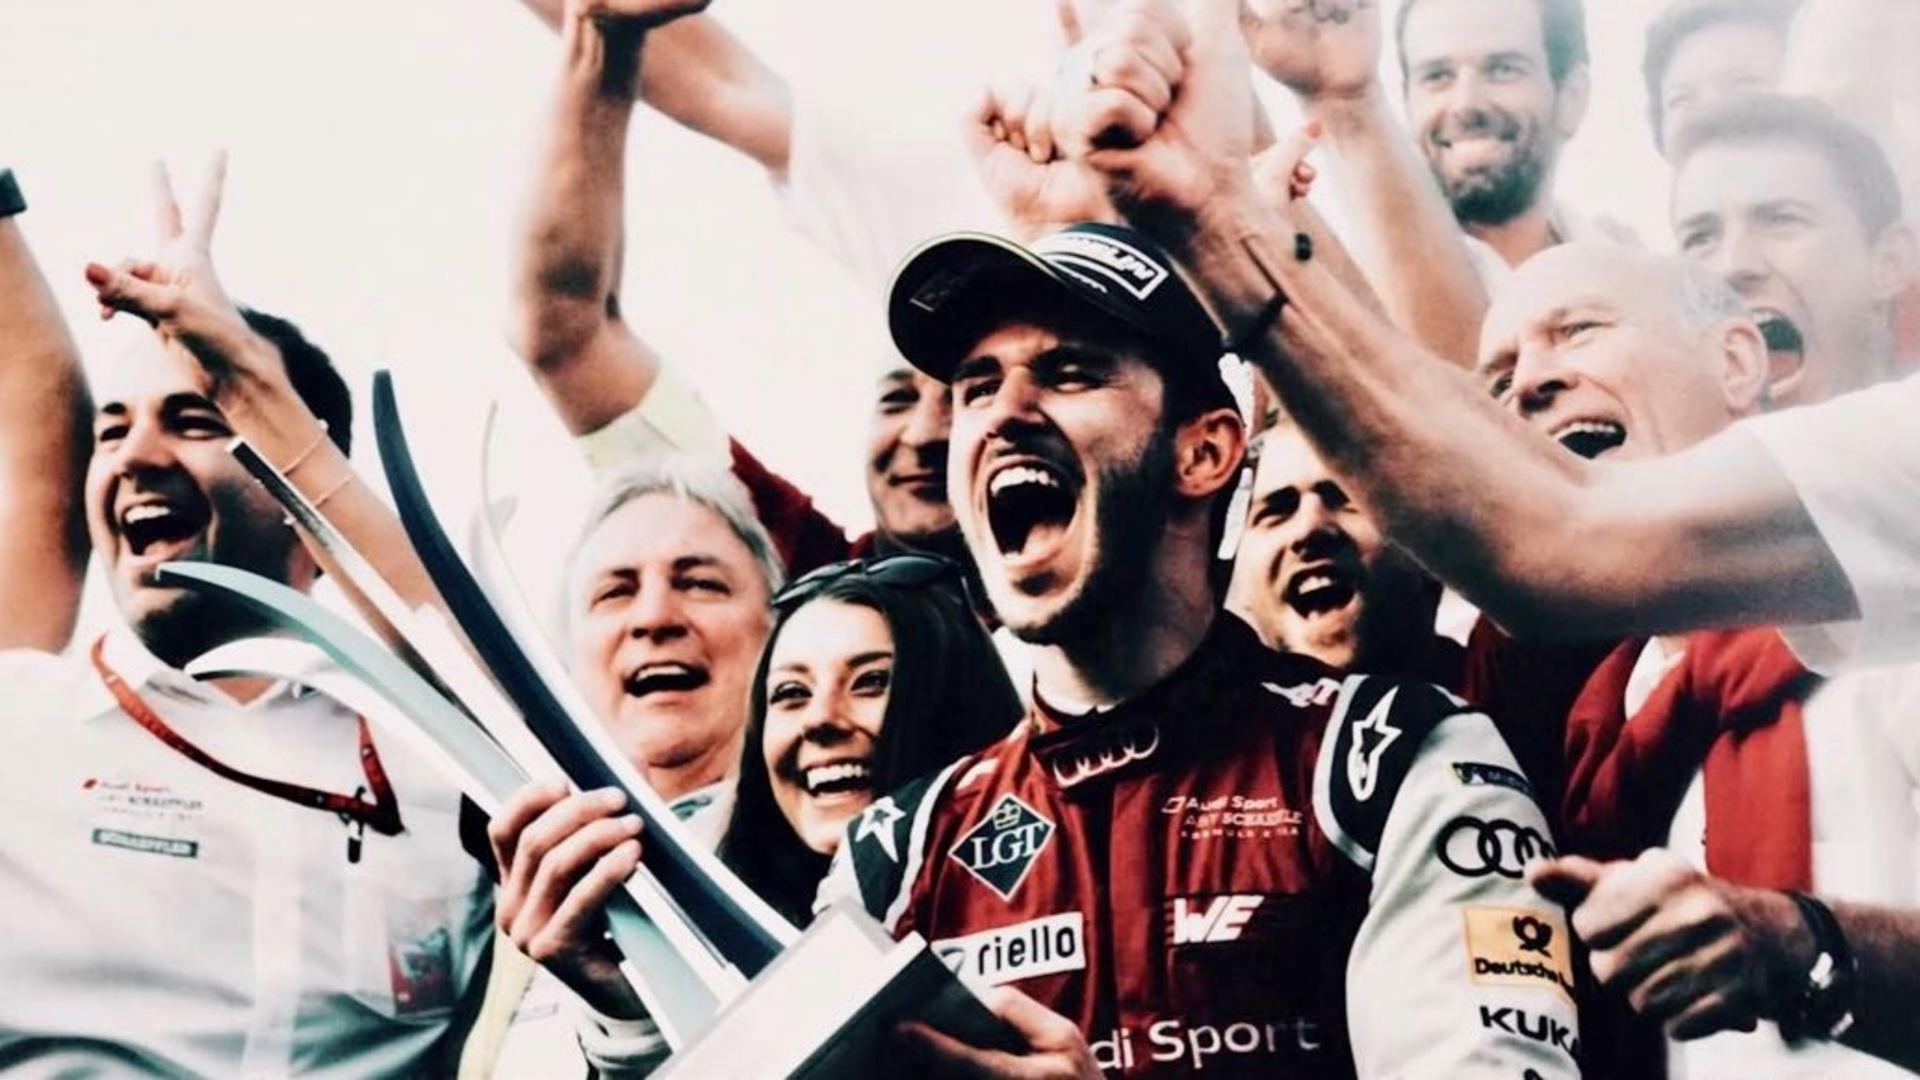 From Zero to Hero: Highlights der Formel E Saison 2017/2018